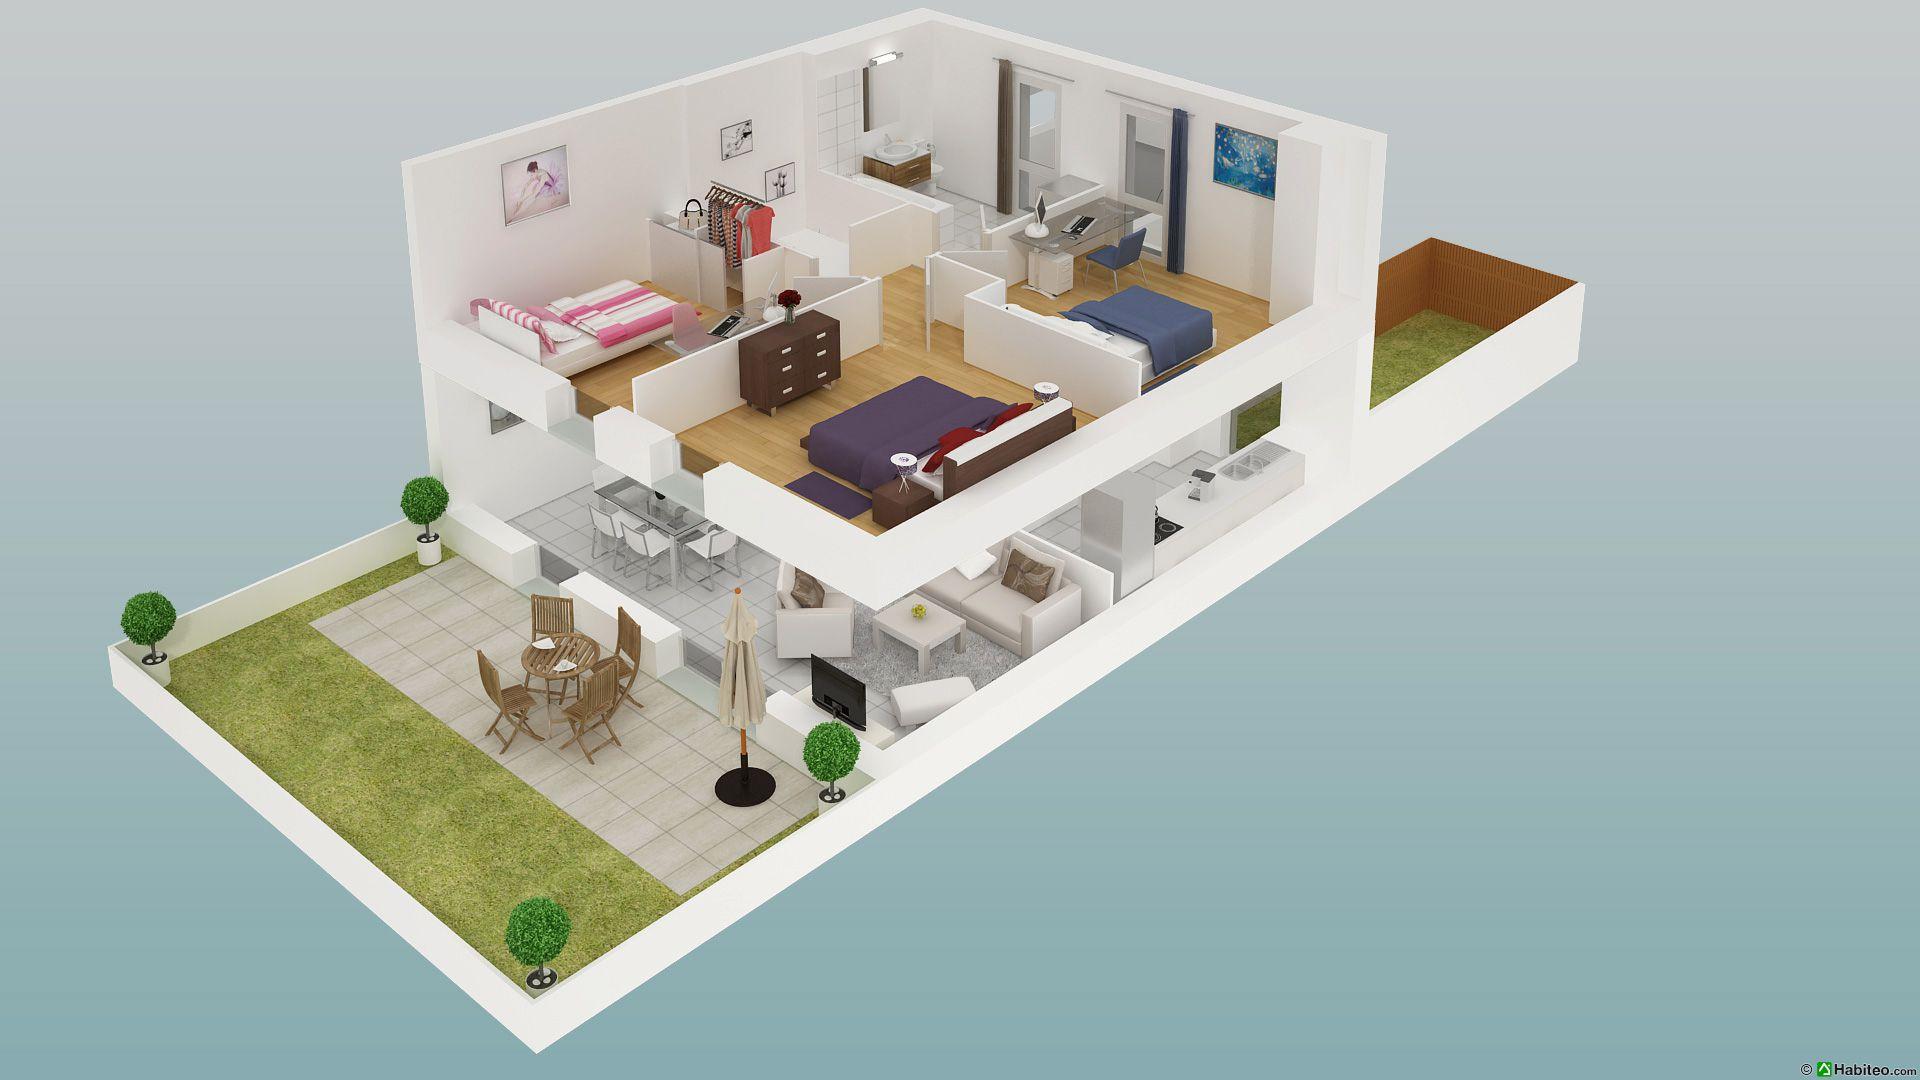 Millefiori, programme immobilier neuf à Rouen